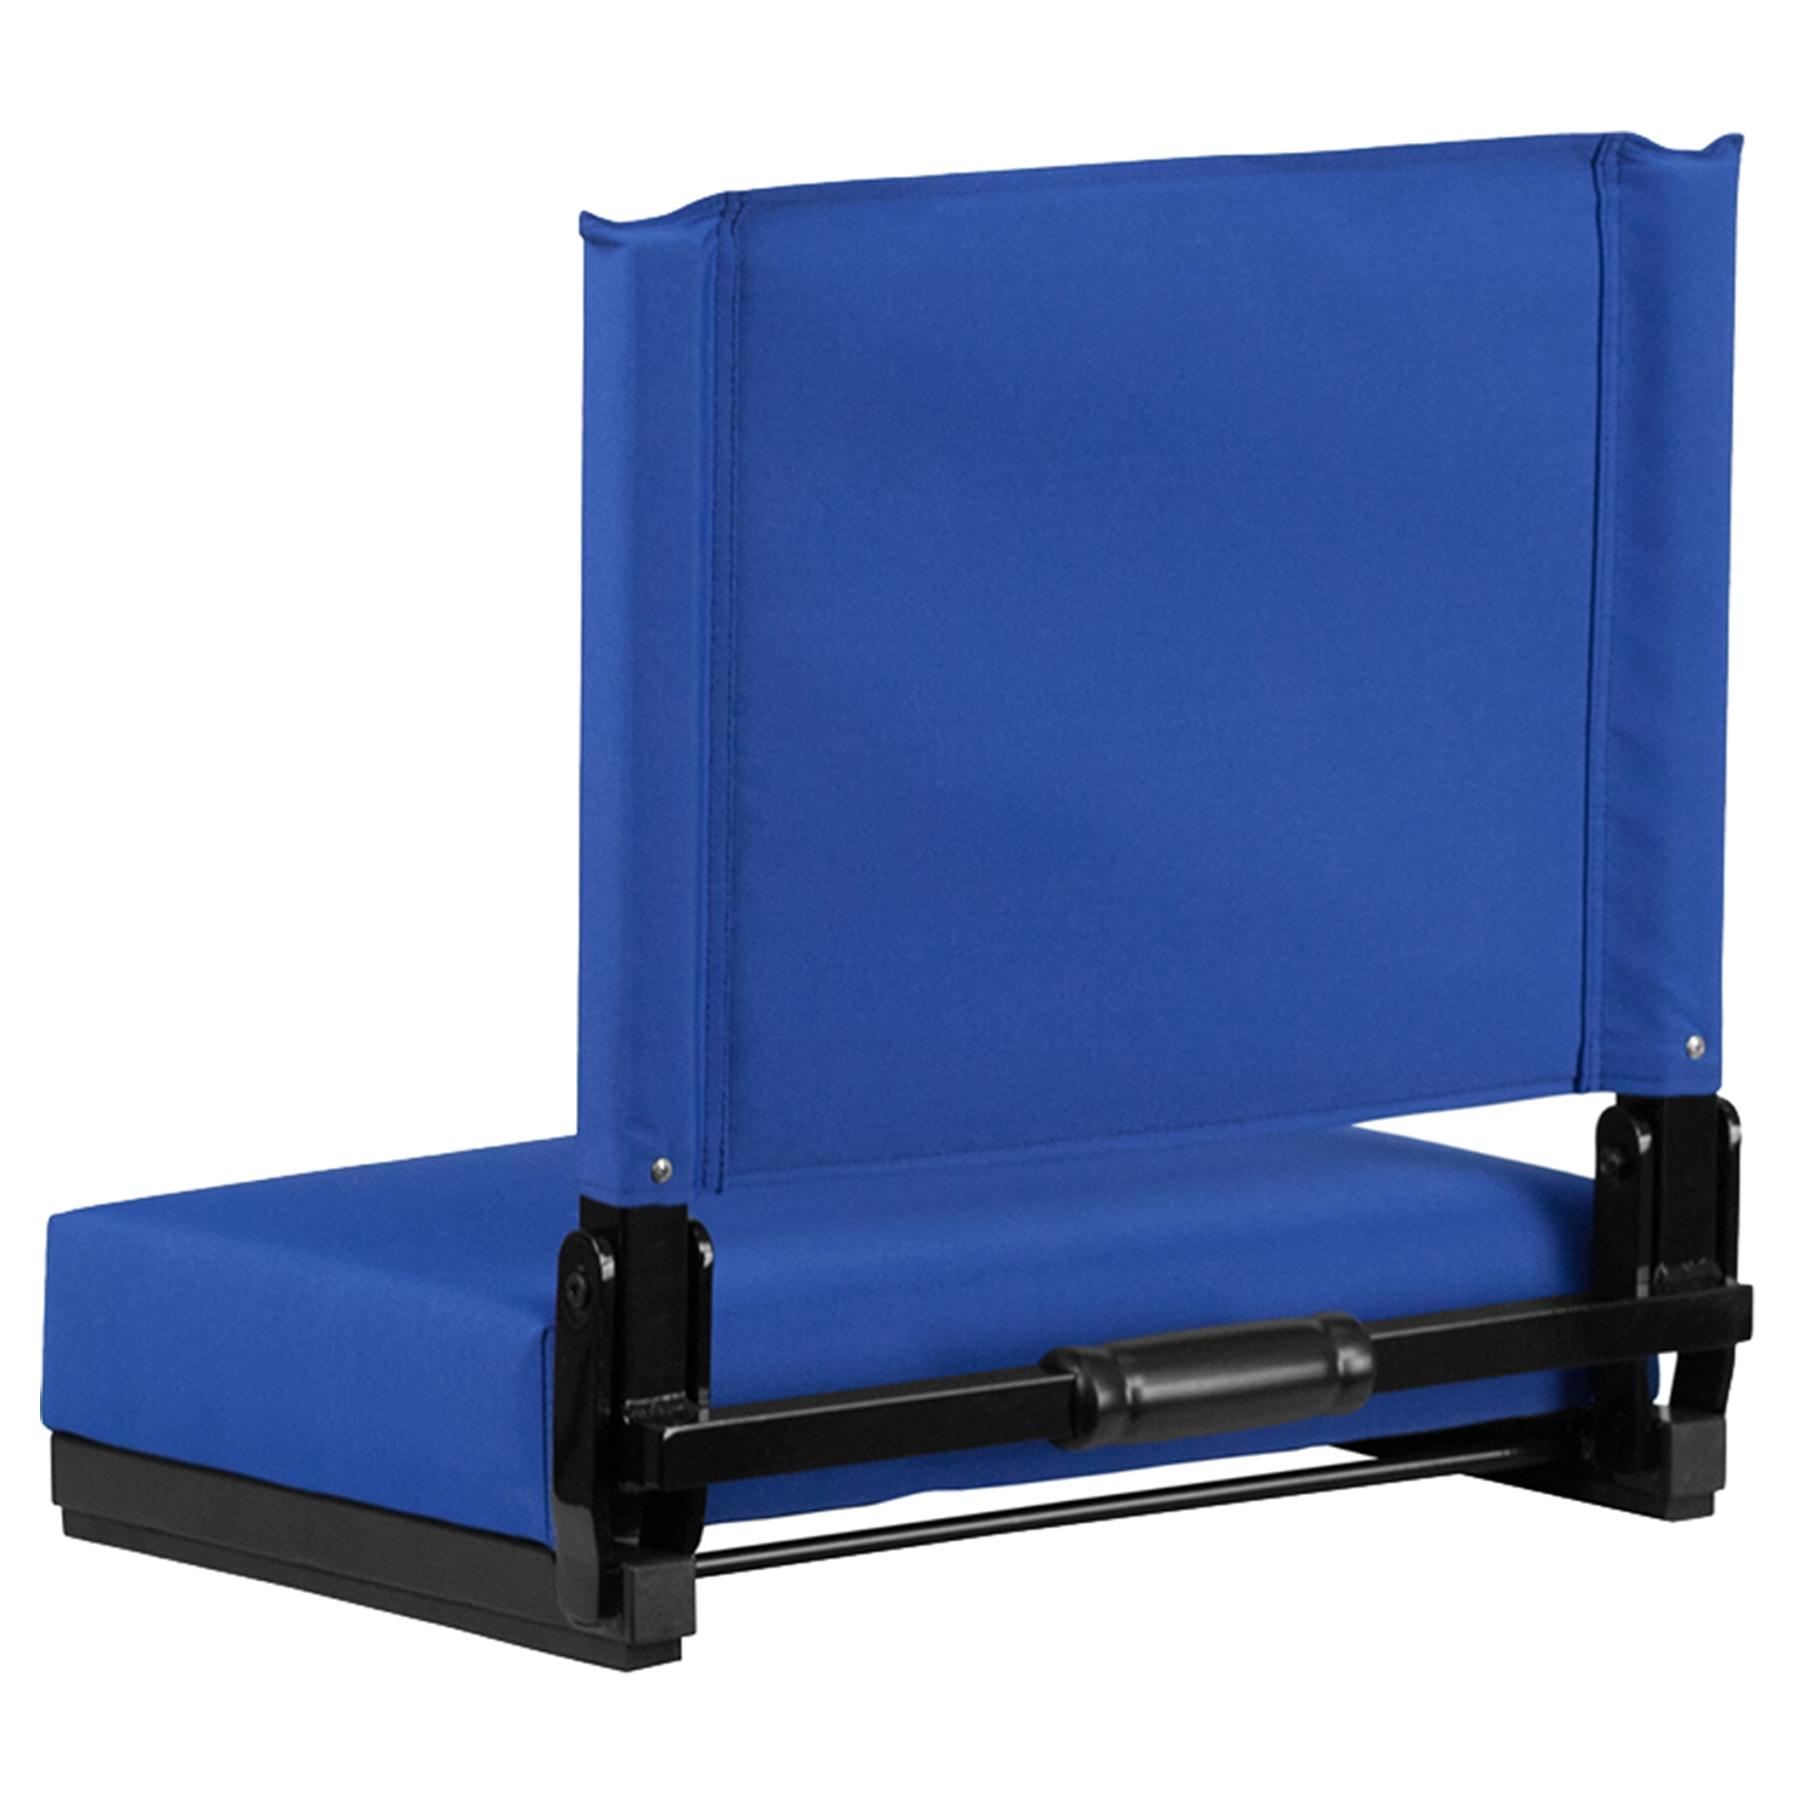 kitchen bistro sets ranges stadium chair - ultra padded seats, blue | dcg stores